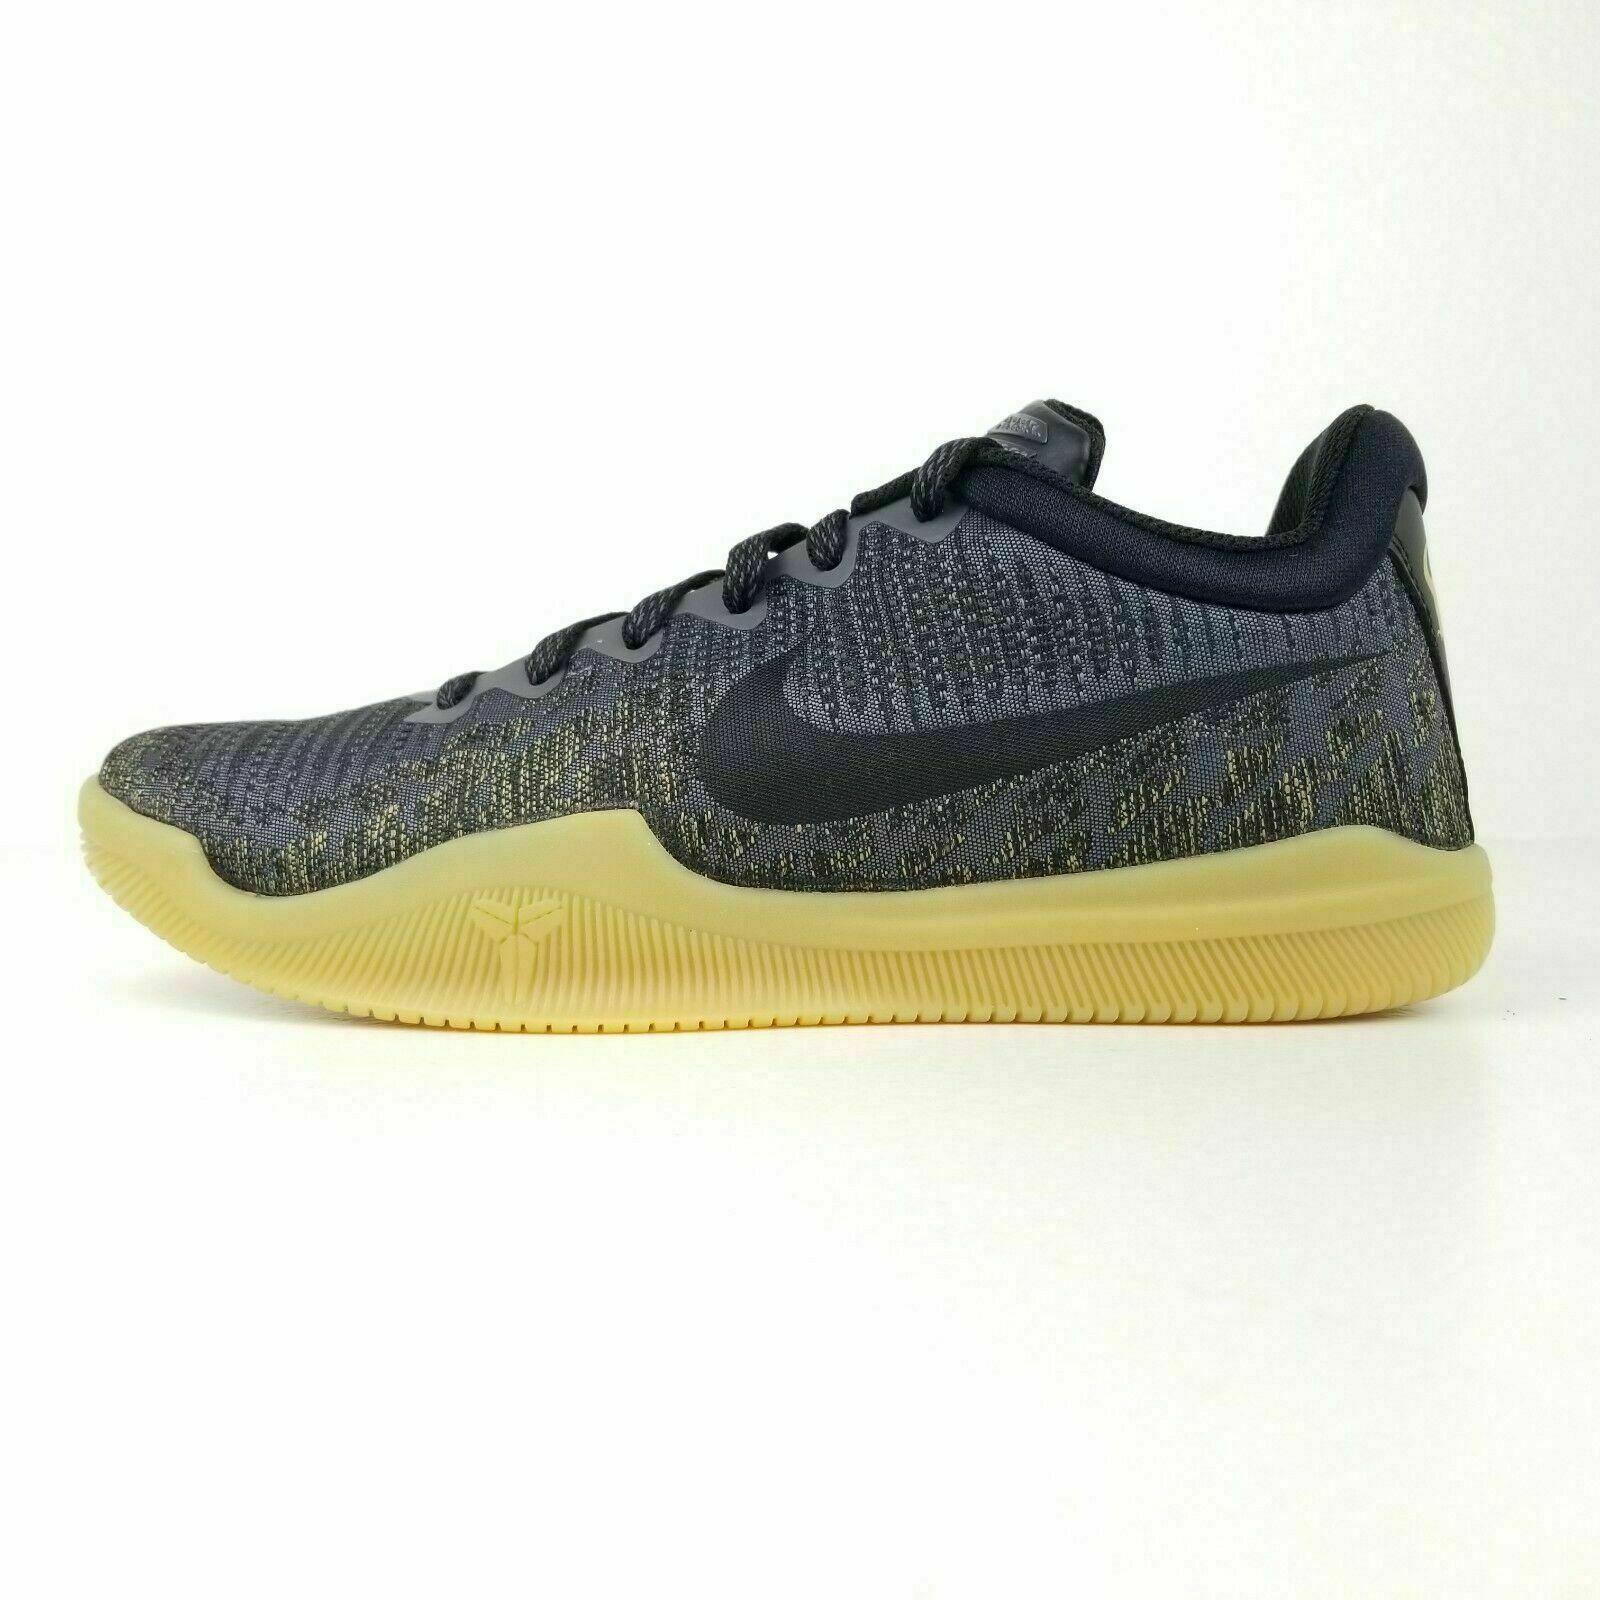 Nike Men's Kobe Mamba Rage PRM Sneakers Size 7 to 13 us AJ7281 020